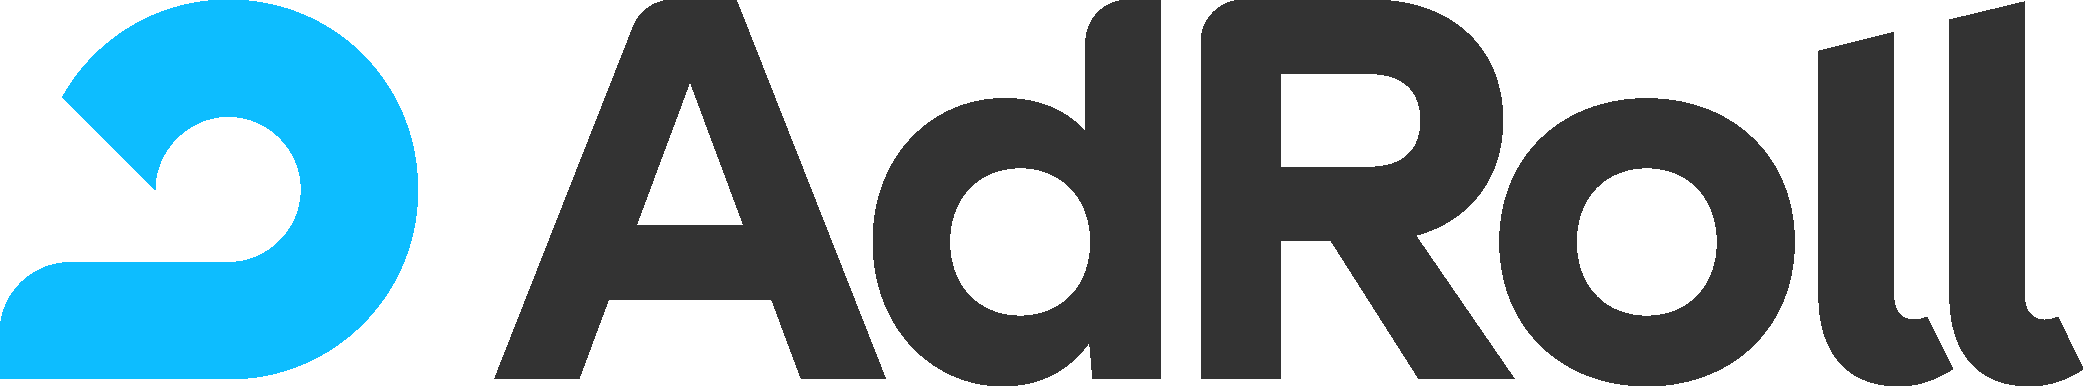 Adroll Logo Download Vector.